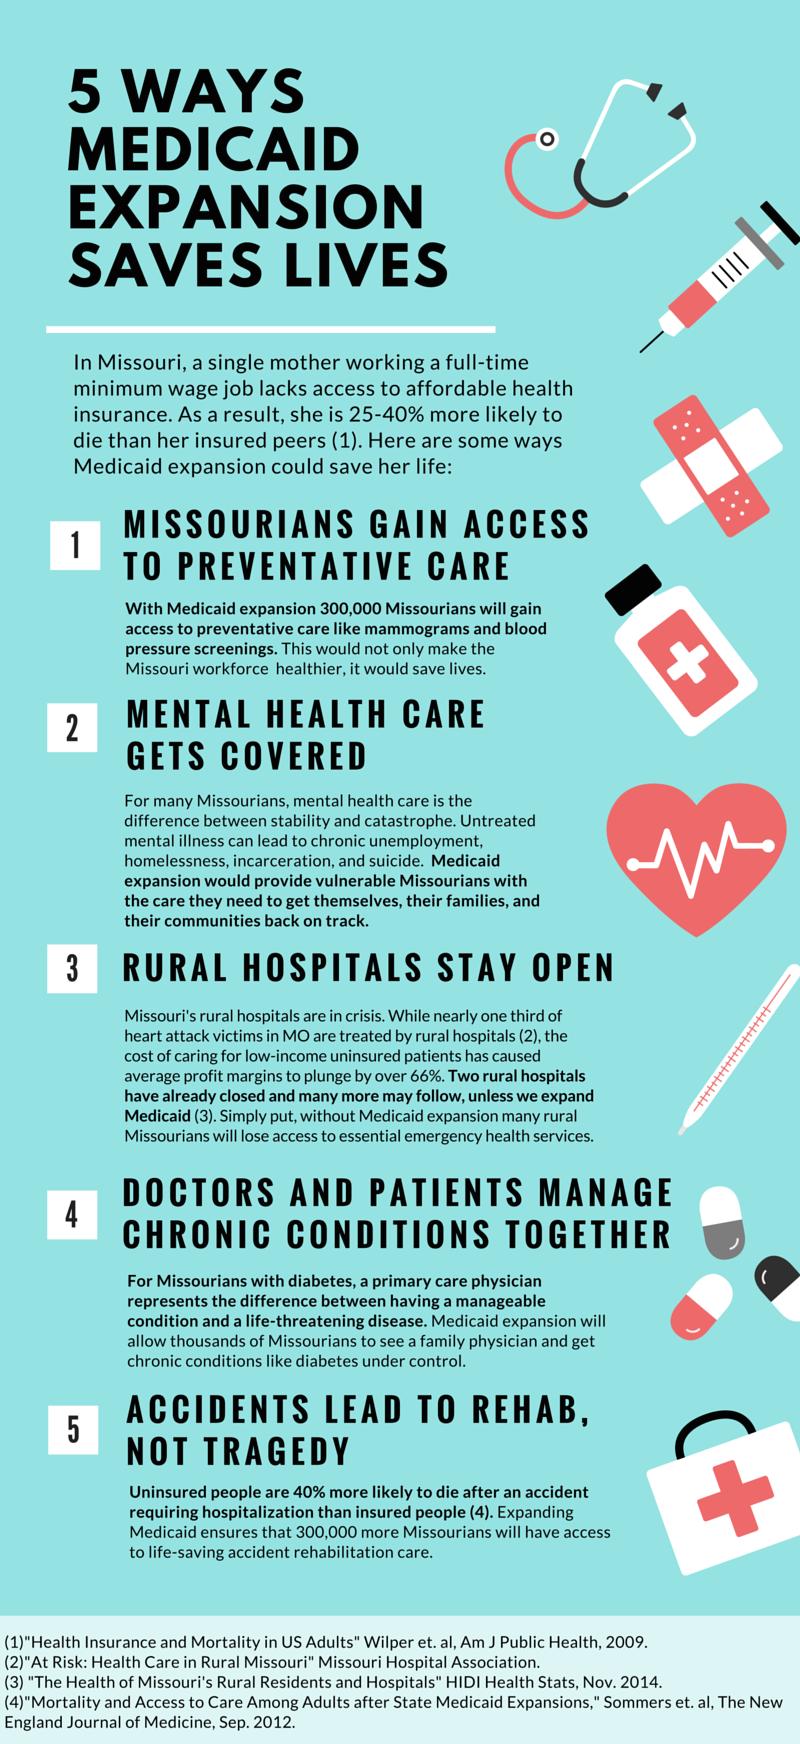 5_Ways_MedicaidExpansionSaves_Lives.png